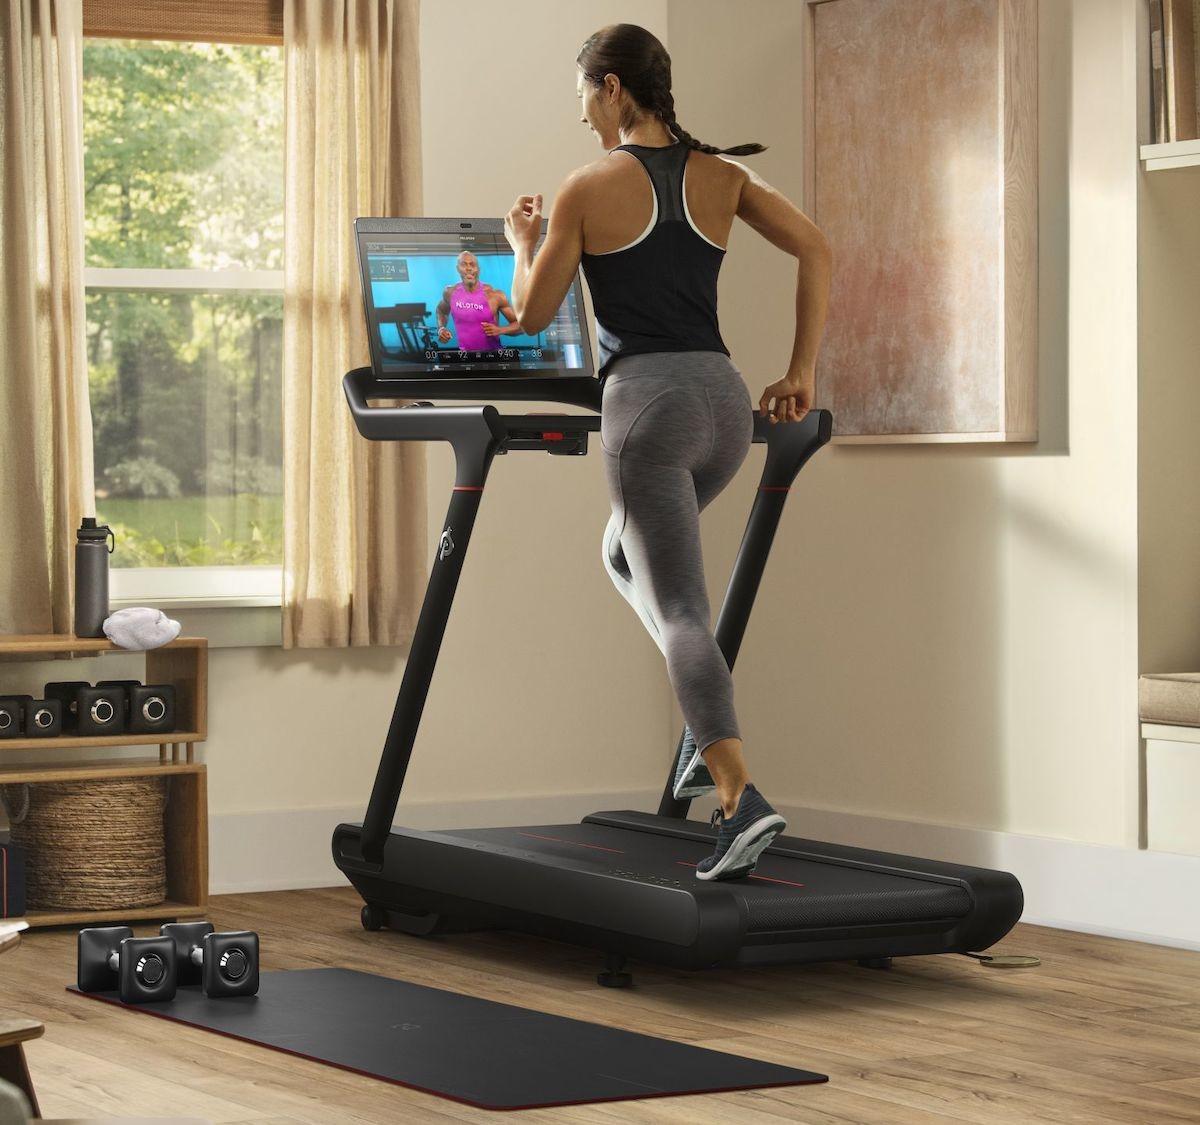 Peloton Tread running machine offers a total body workout